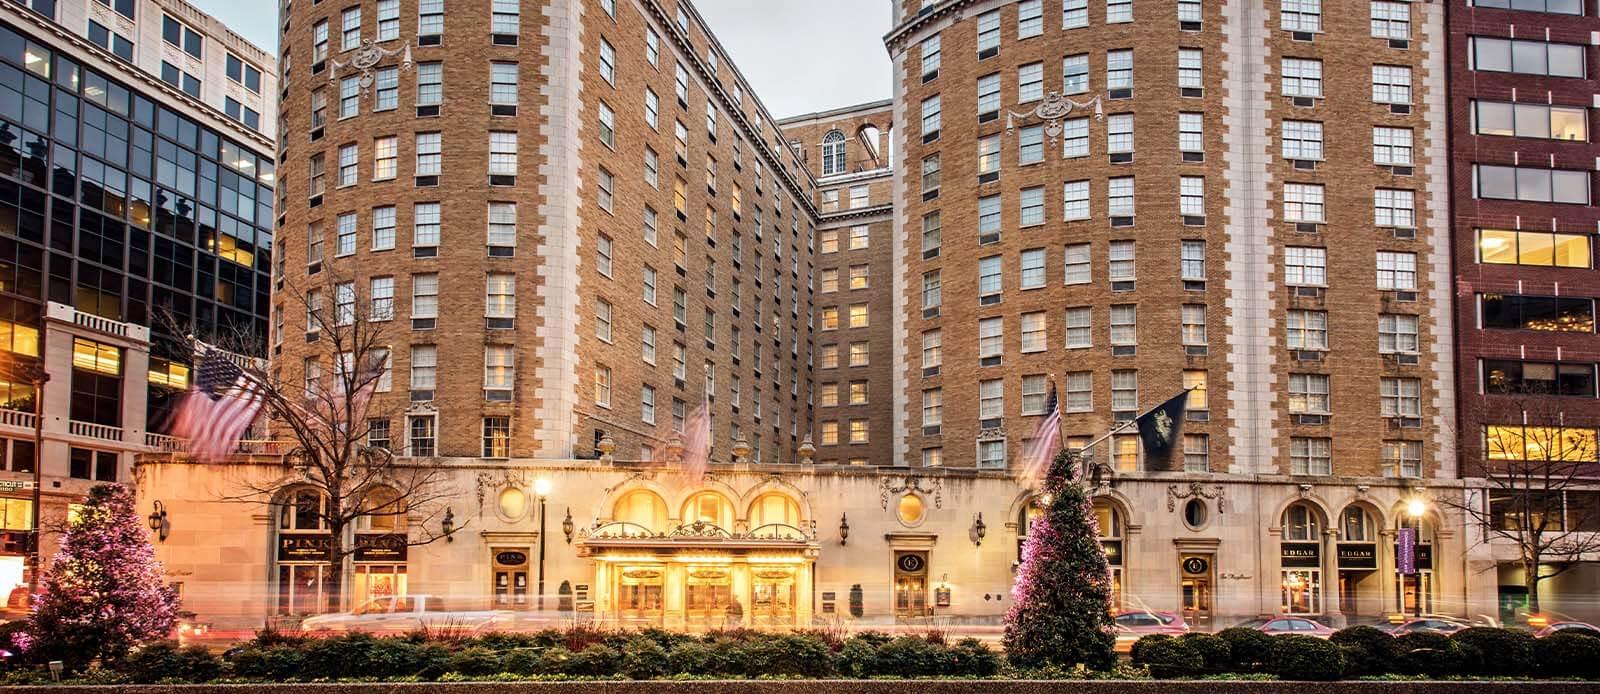 Best Destination Hotel Rates - Guaranteed